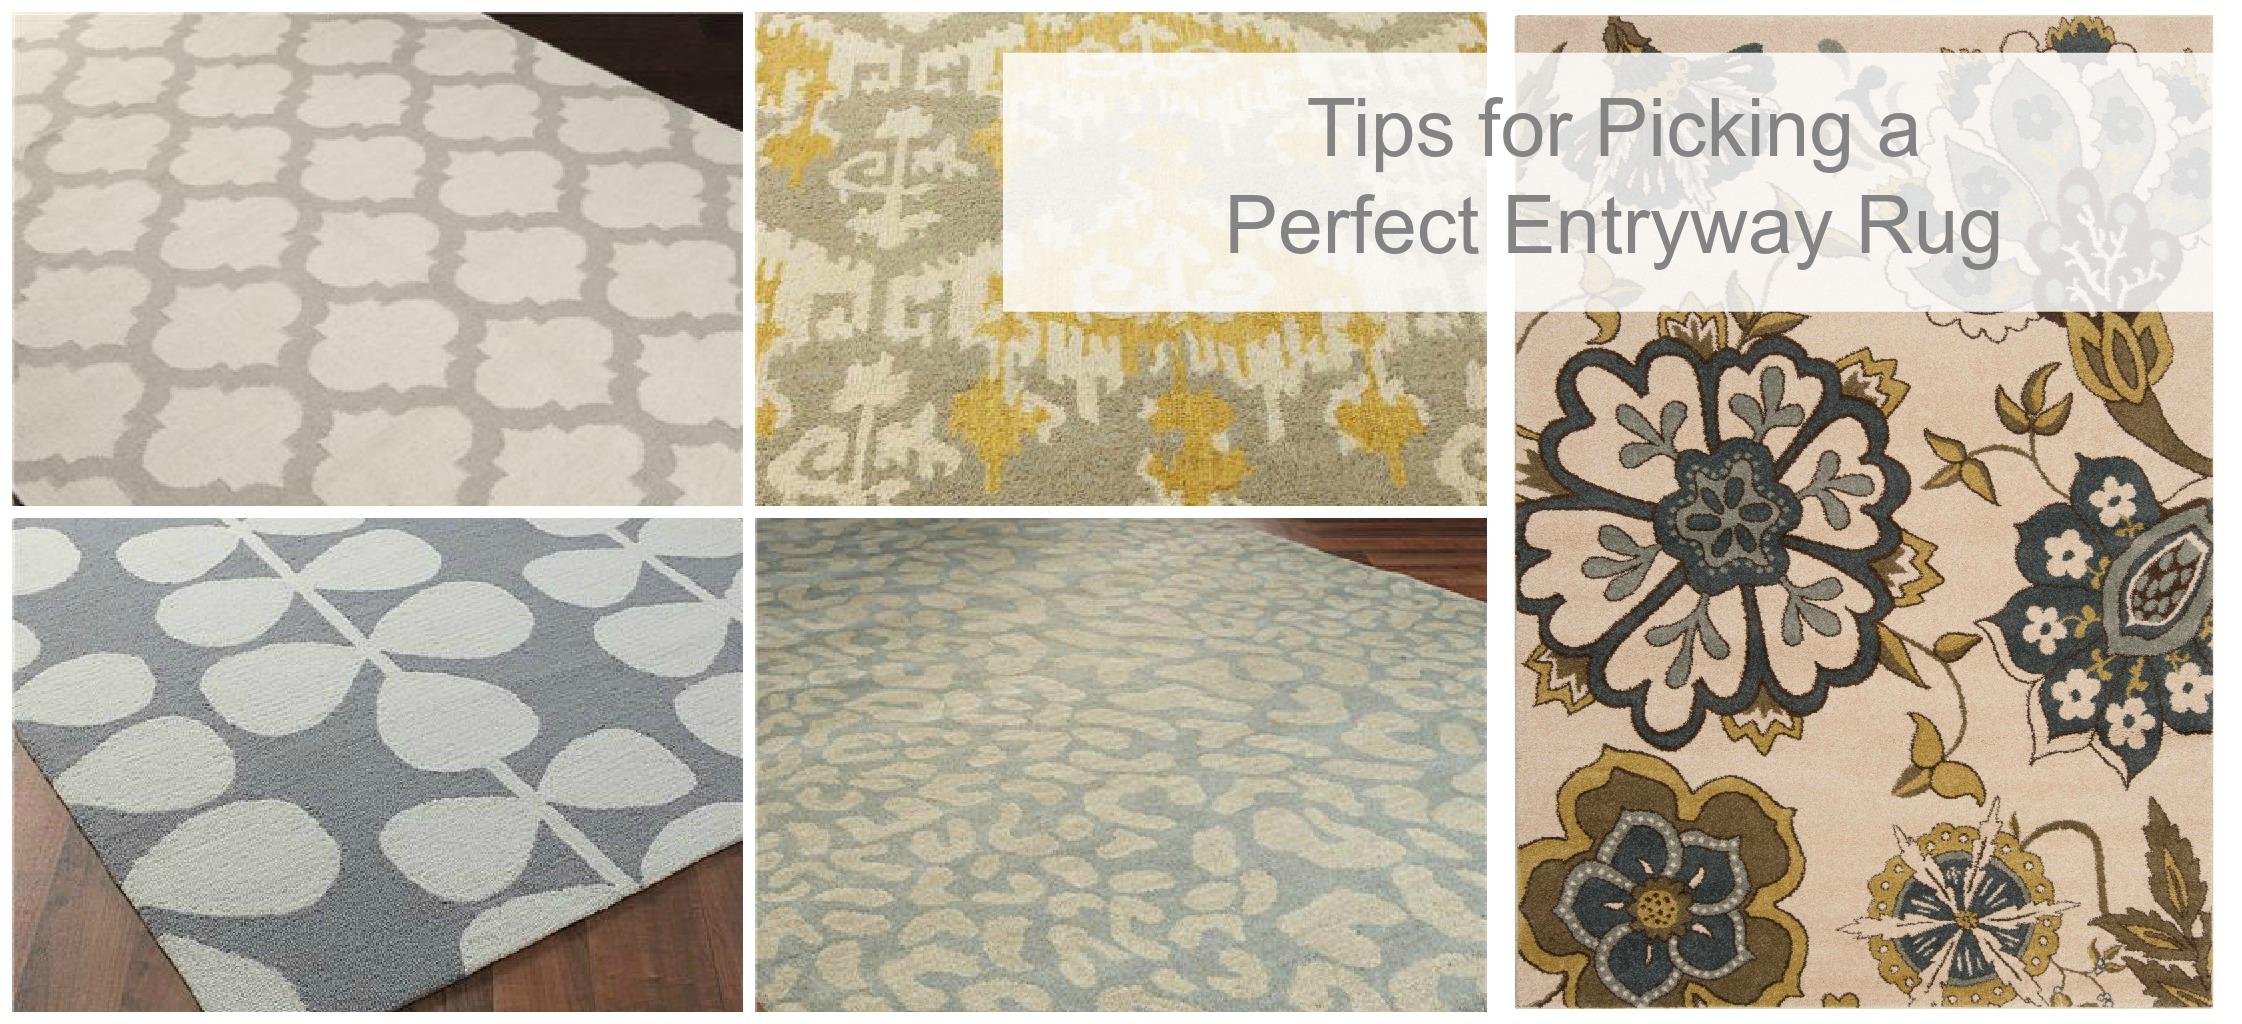 Merveilleux Selecting Flooring? No Problem. Choosing Paint Colors? No Big Deal.  Choosing A Rug, Even A Small 2×3 For The Entryway?